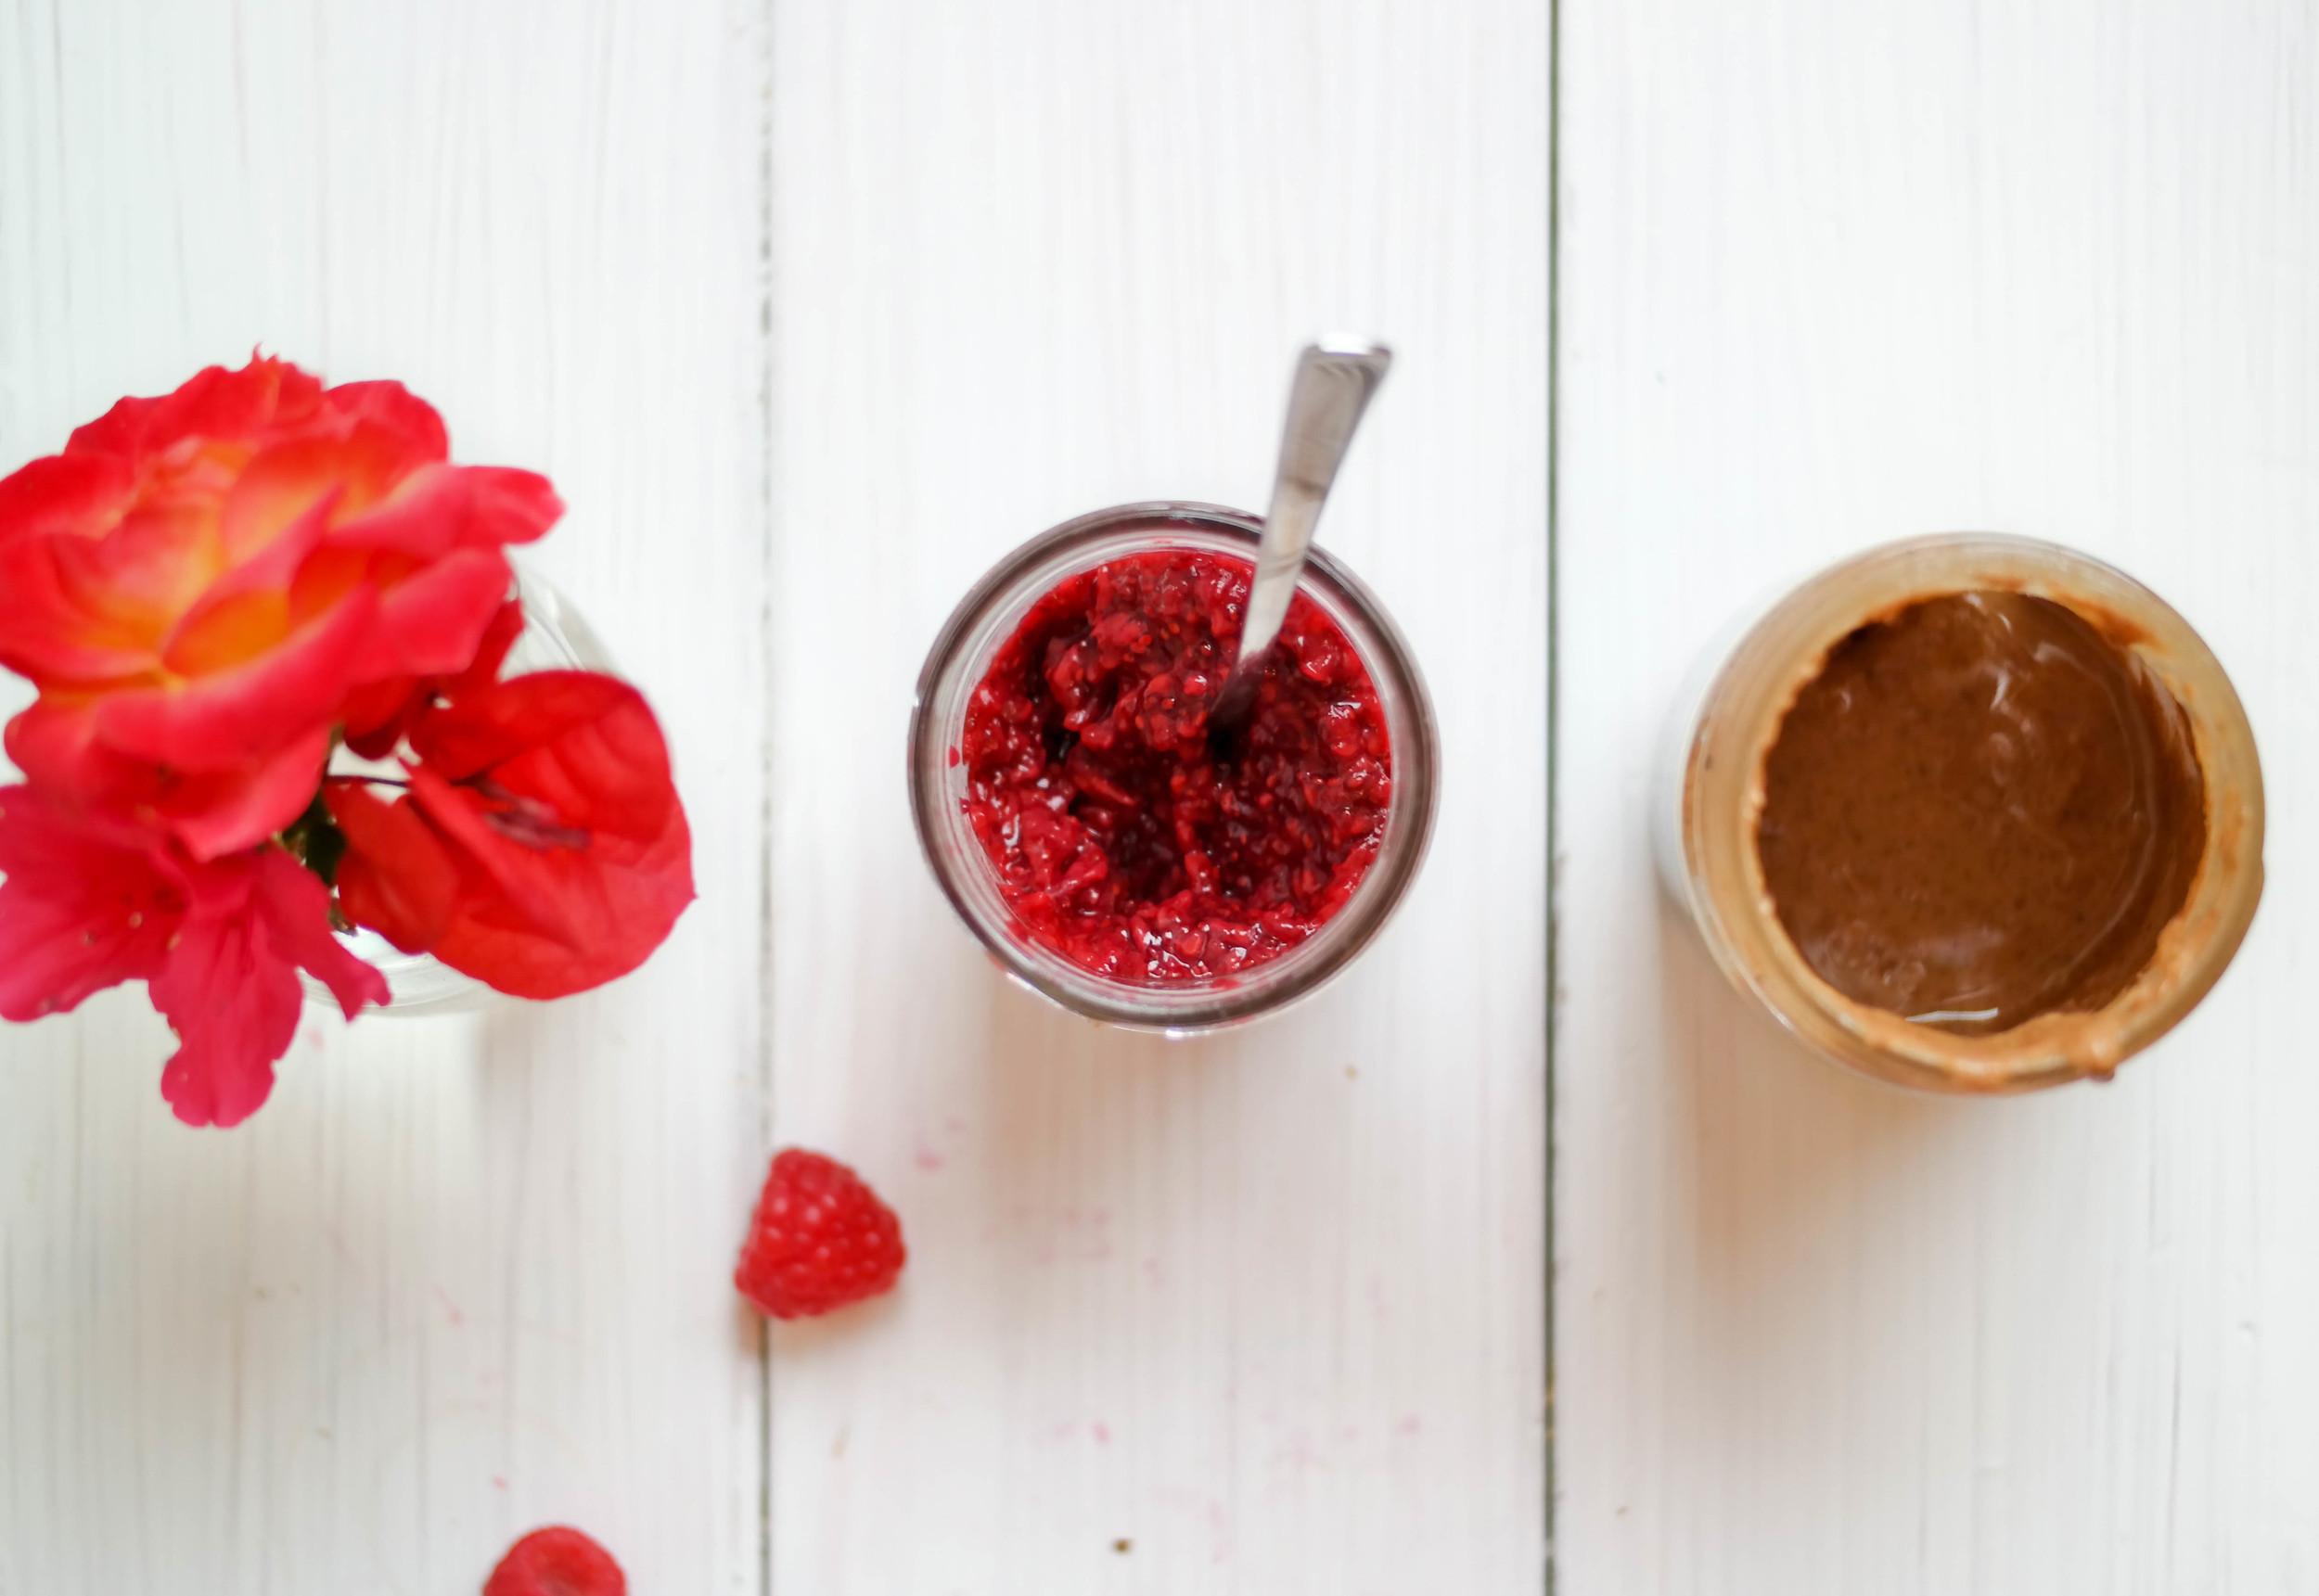 4-The-Best-Raspberry-Chia-Seed-Jam-On-Almond-Butter-Toast | www.8thandlake.com